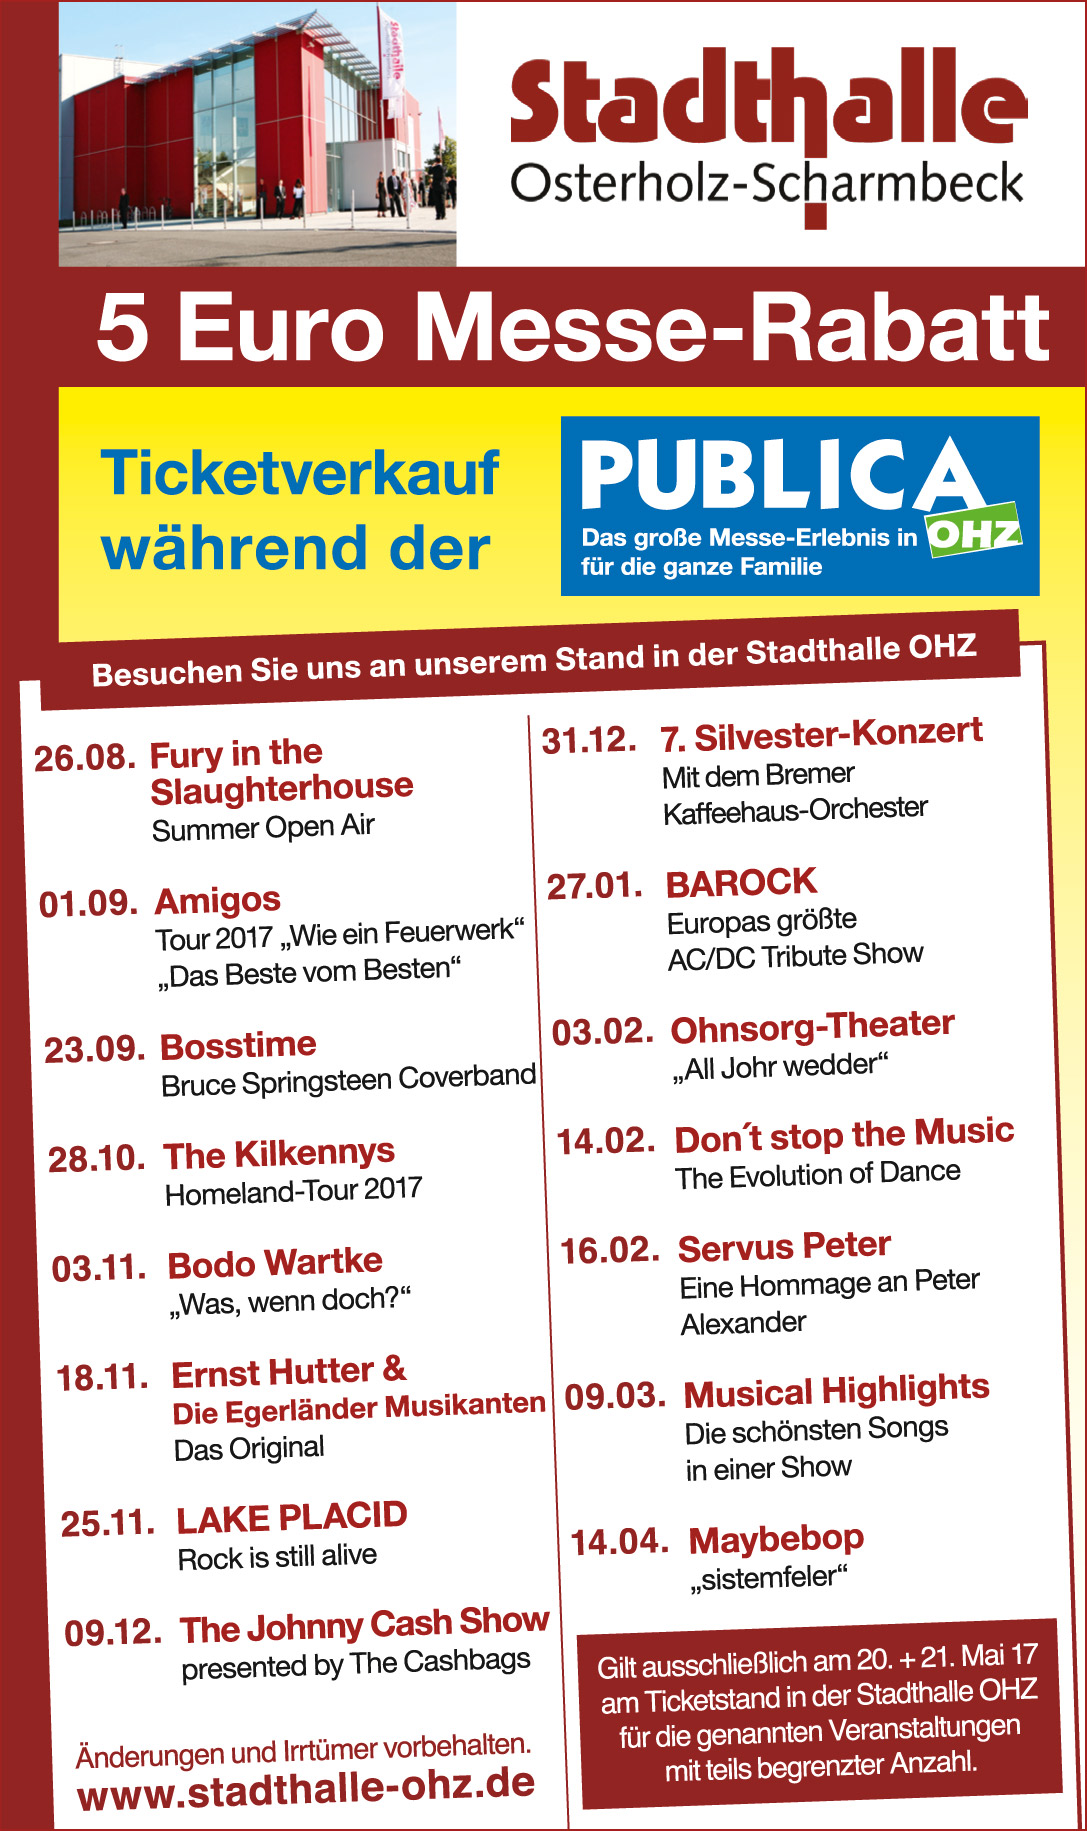 Stadthalle Osterholz-Scharmbeck, Publica 2017, 5 Euro Messe Rabatt